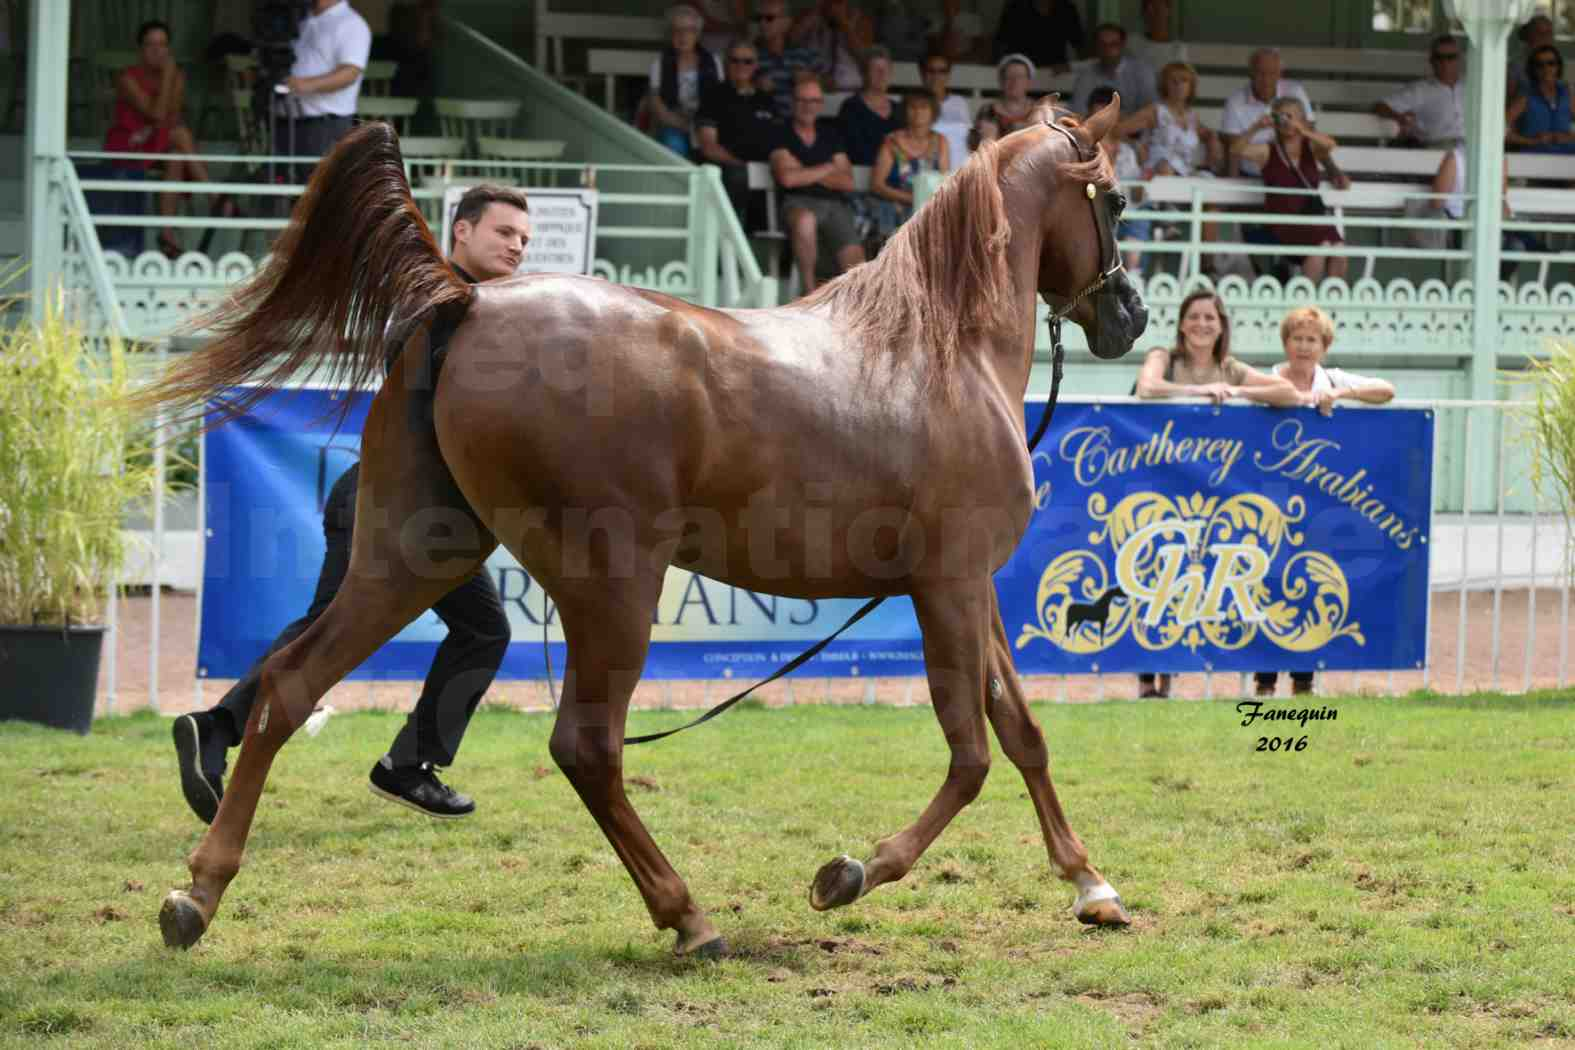 International Arabian Horse Show B de VICHY 2016 - PEARL DE DJOON - Notre Sélection - 33